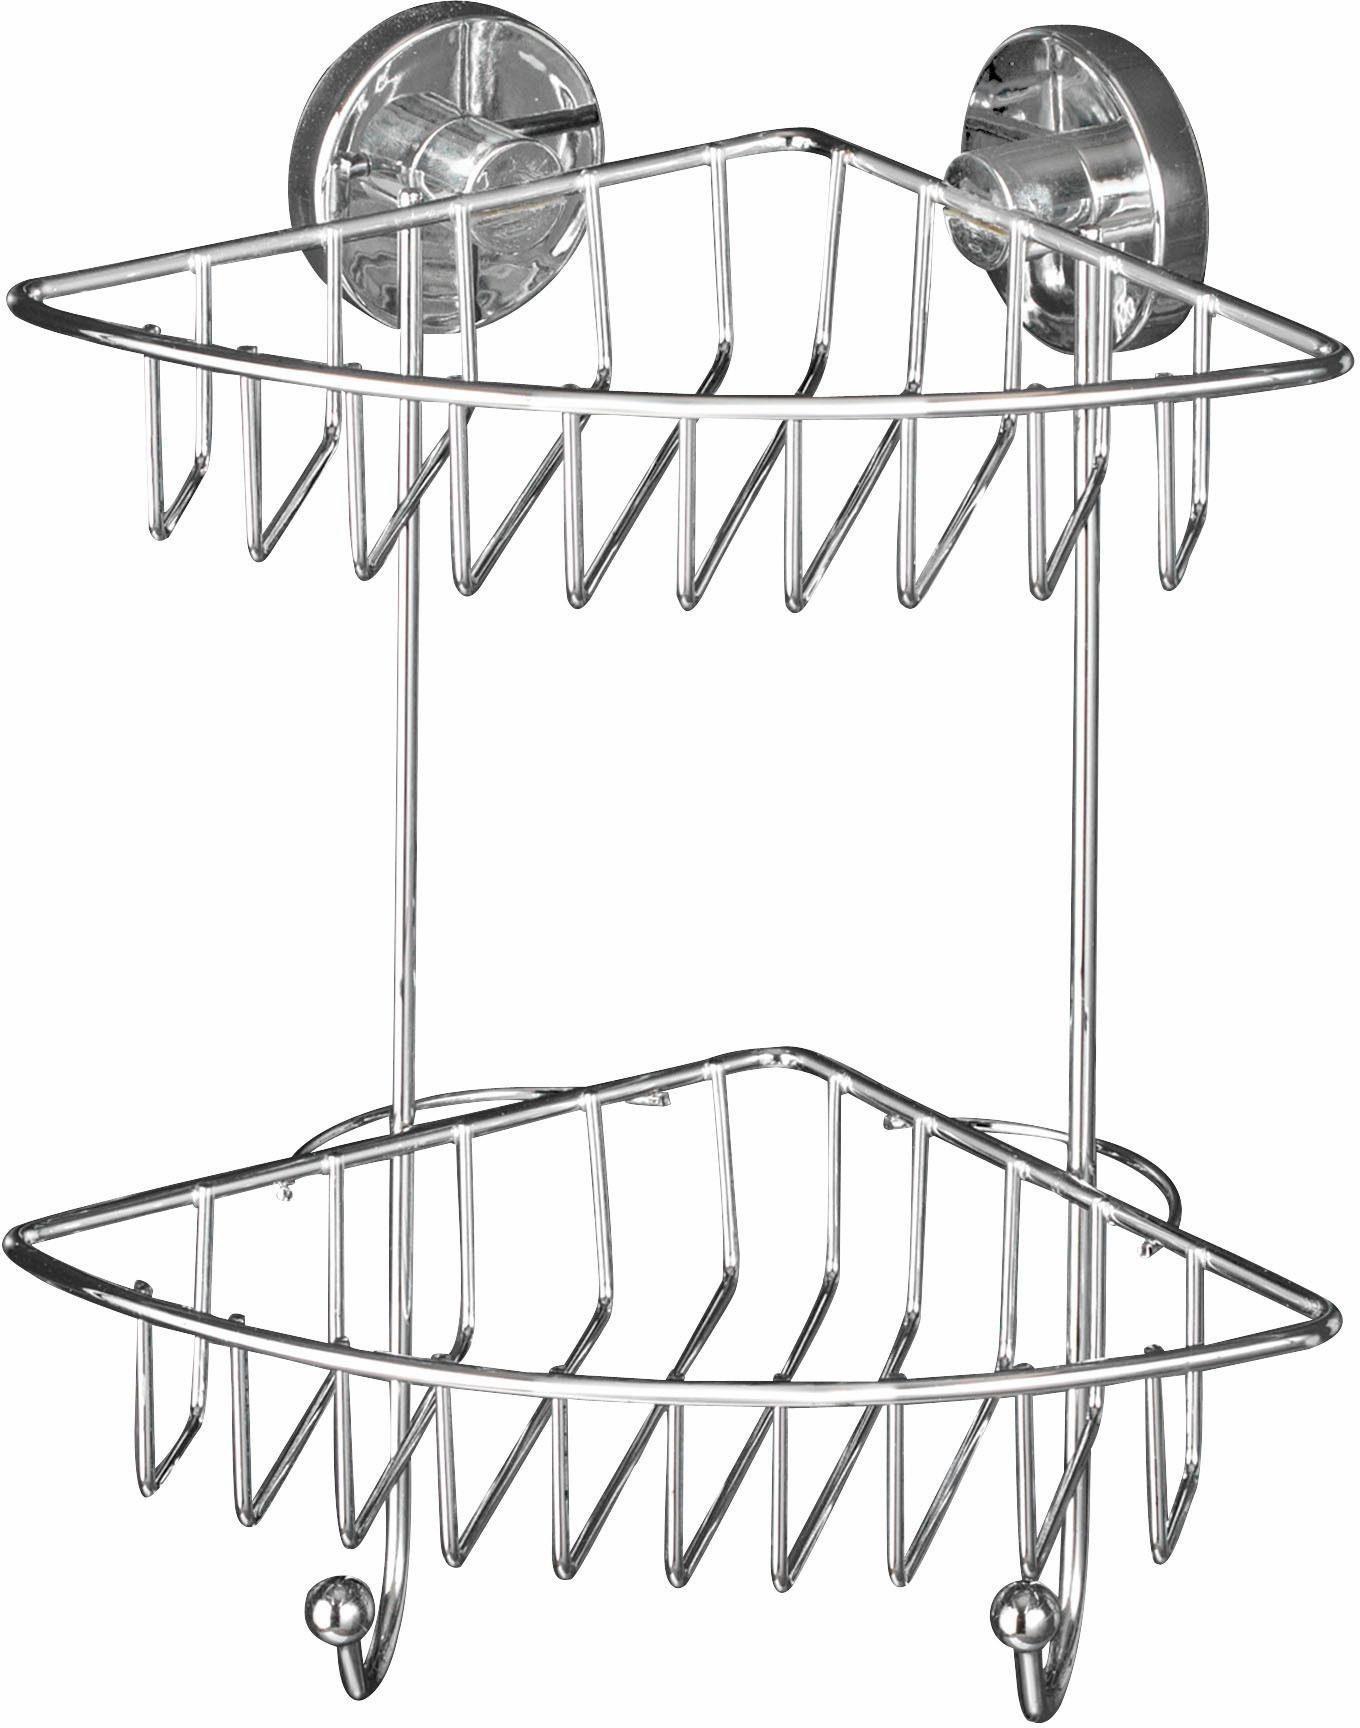 WENKO Vacuum-Loc Eckregal »Bari«, Befestigen ohne bohren